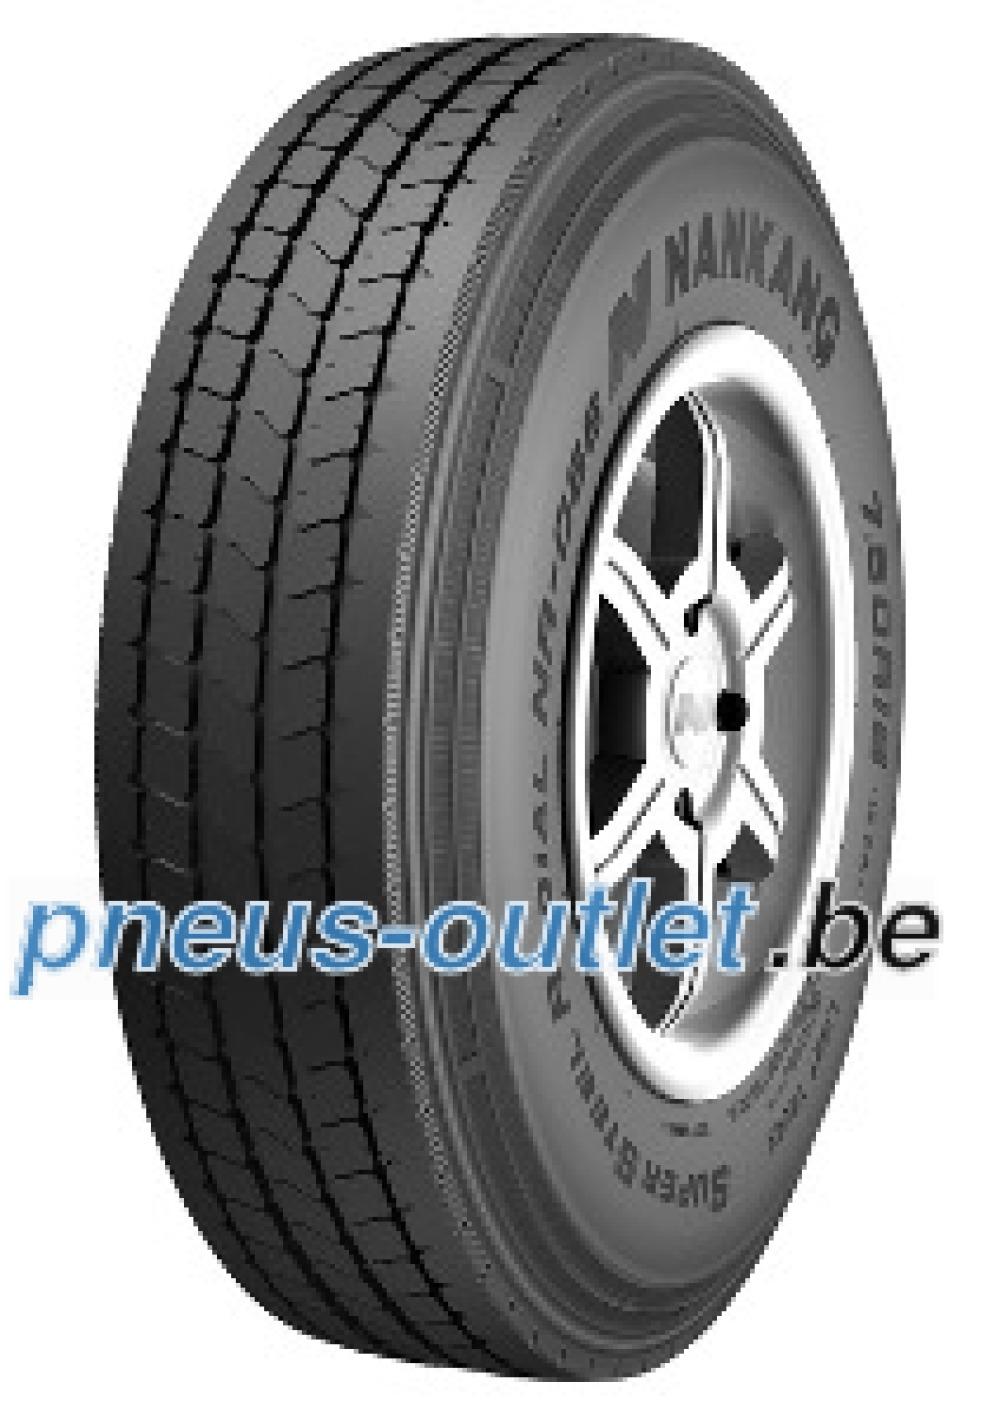 pneus nr achat vente de pneus pas cher. Black Bedroom Furniture Sets. Home Design Ideas